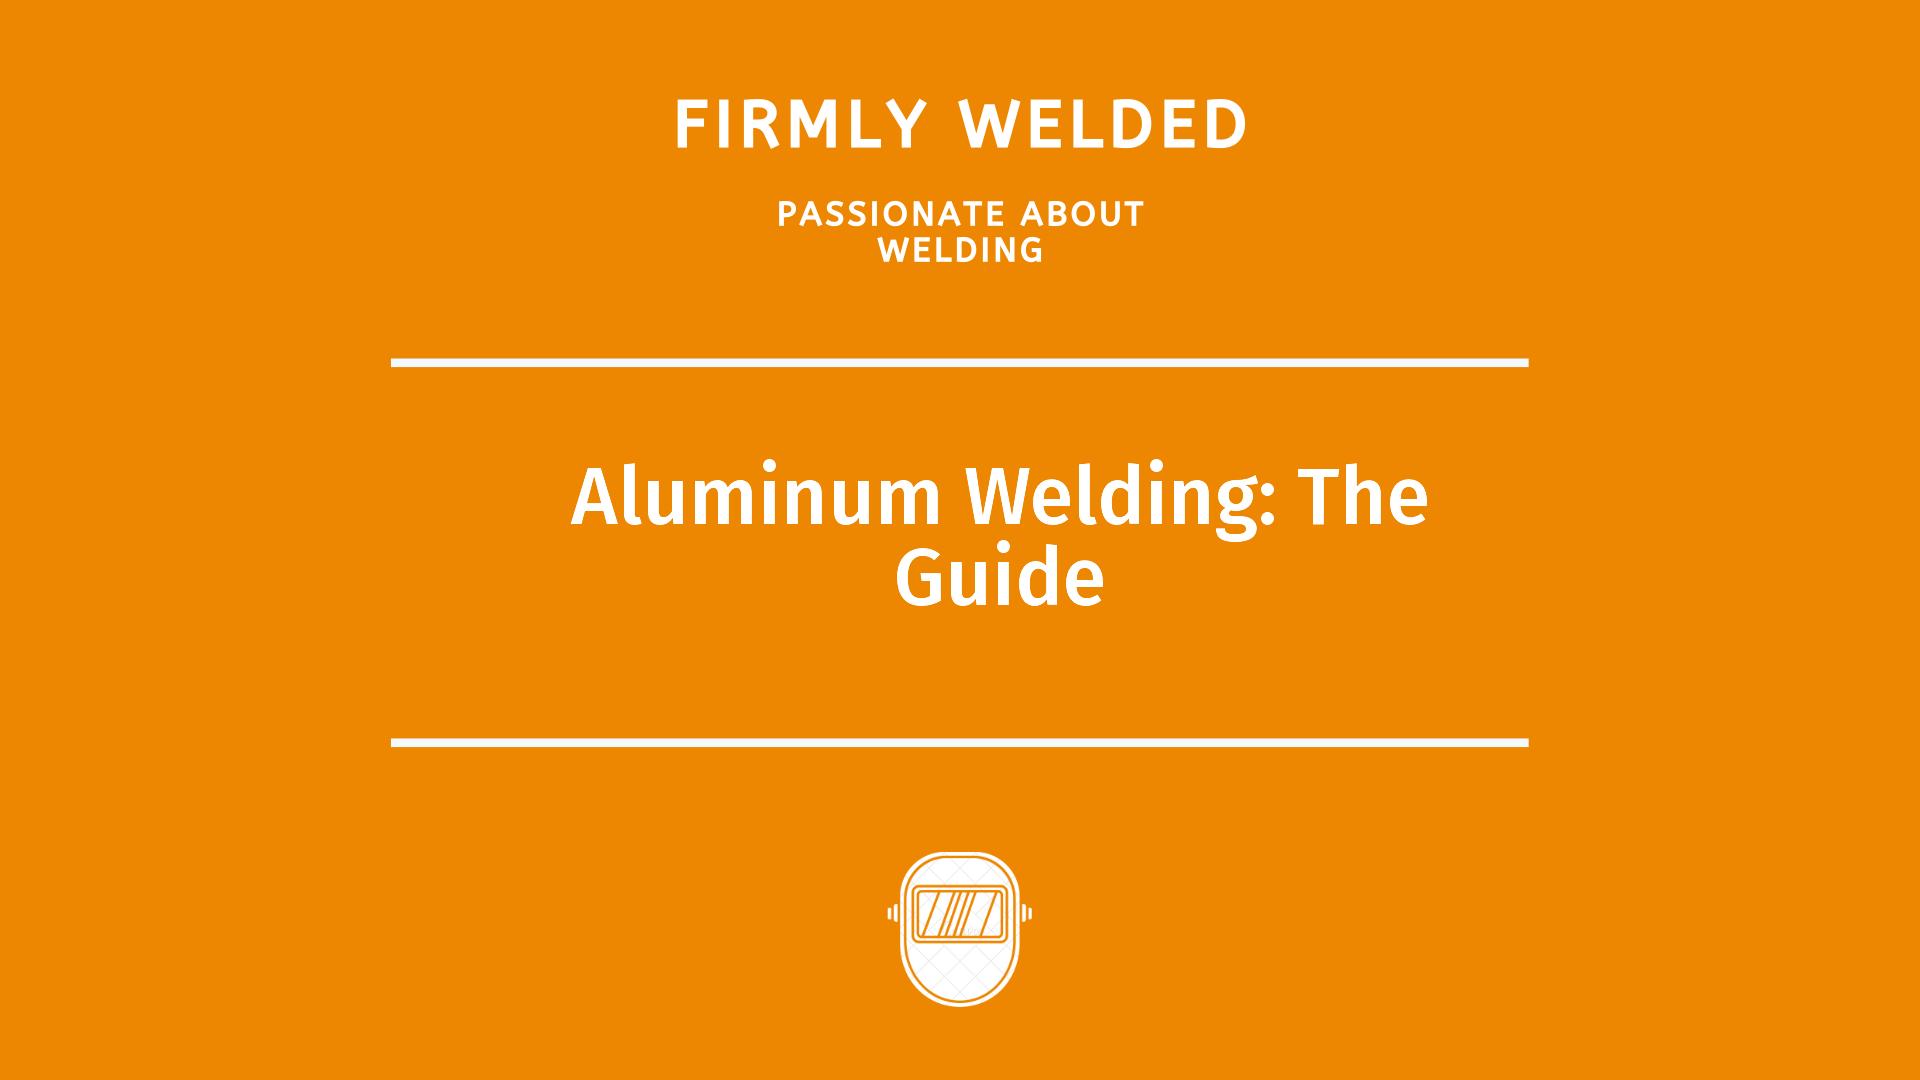 Aluminum Welding: The Guide